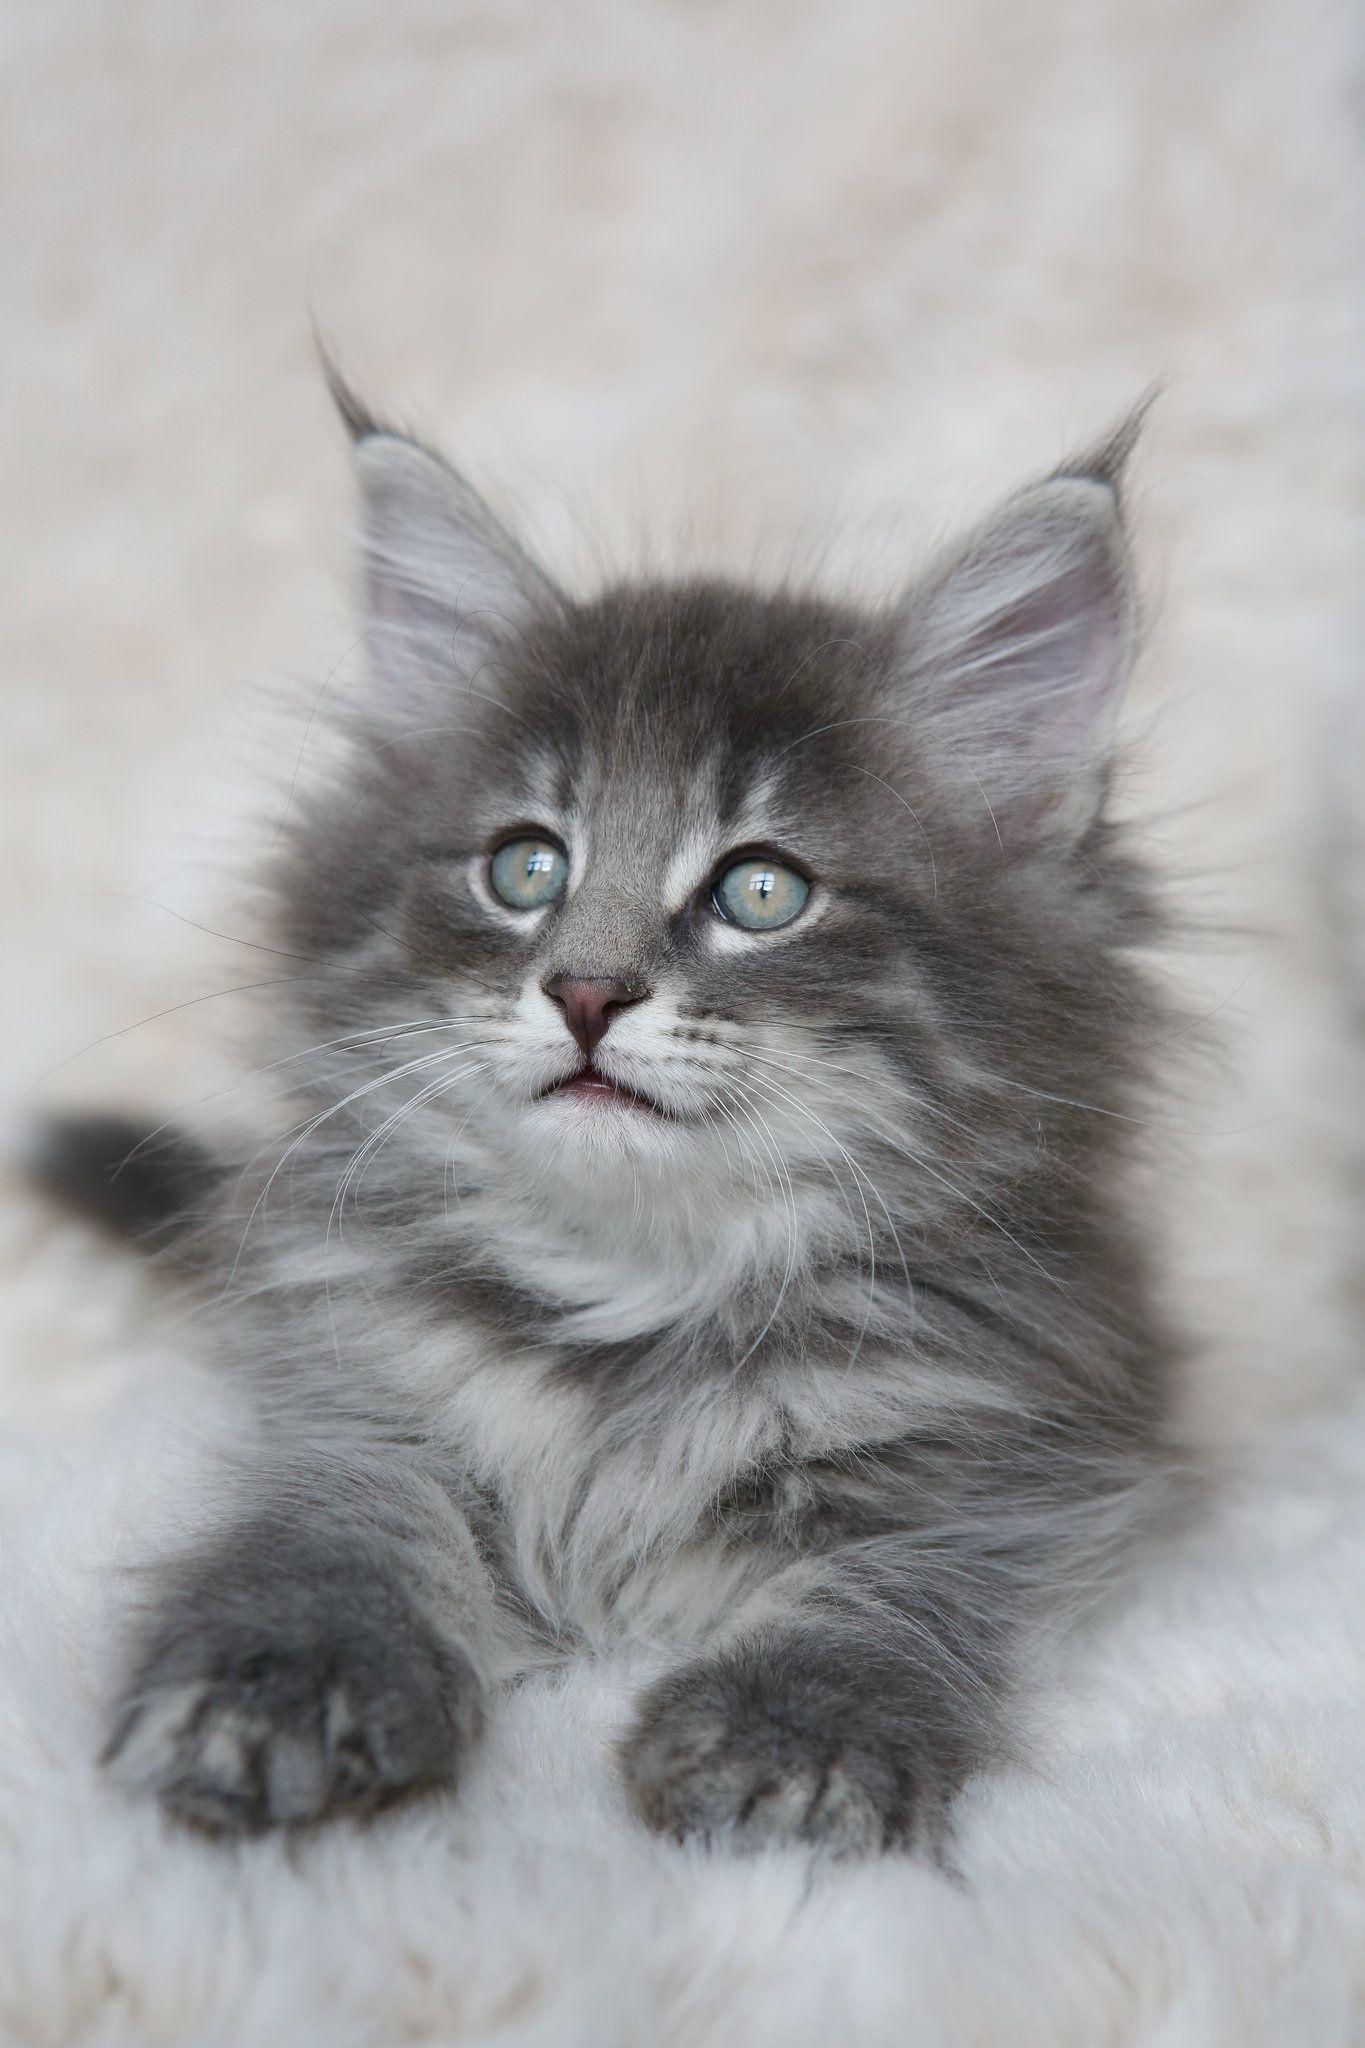 Nl Titran S Wenceslas 2 Months Old Male Kitten Cute Cats And Kittens Kittens Cutest Beautiful Cats